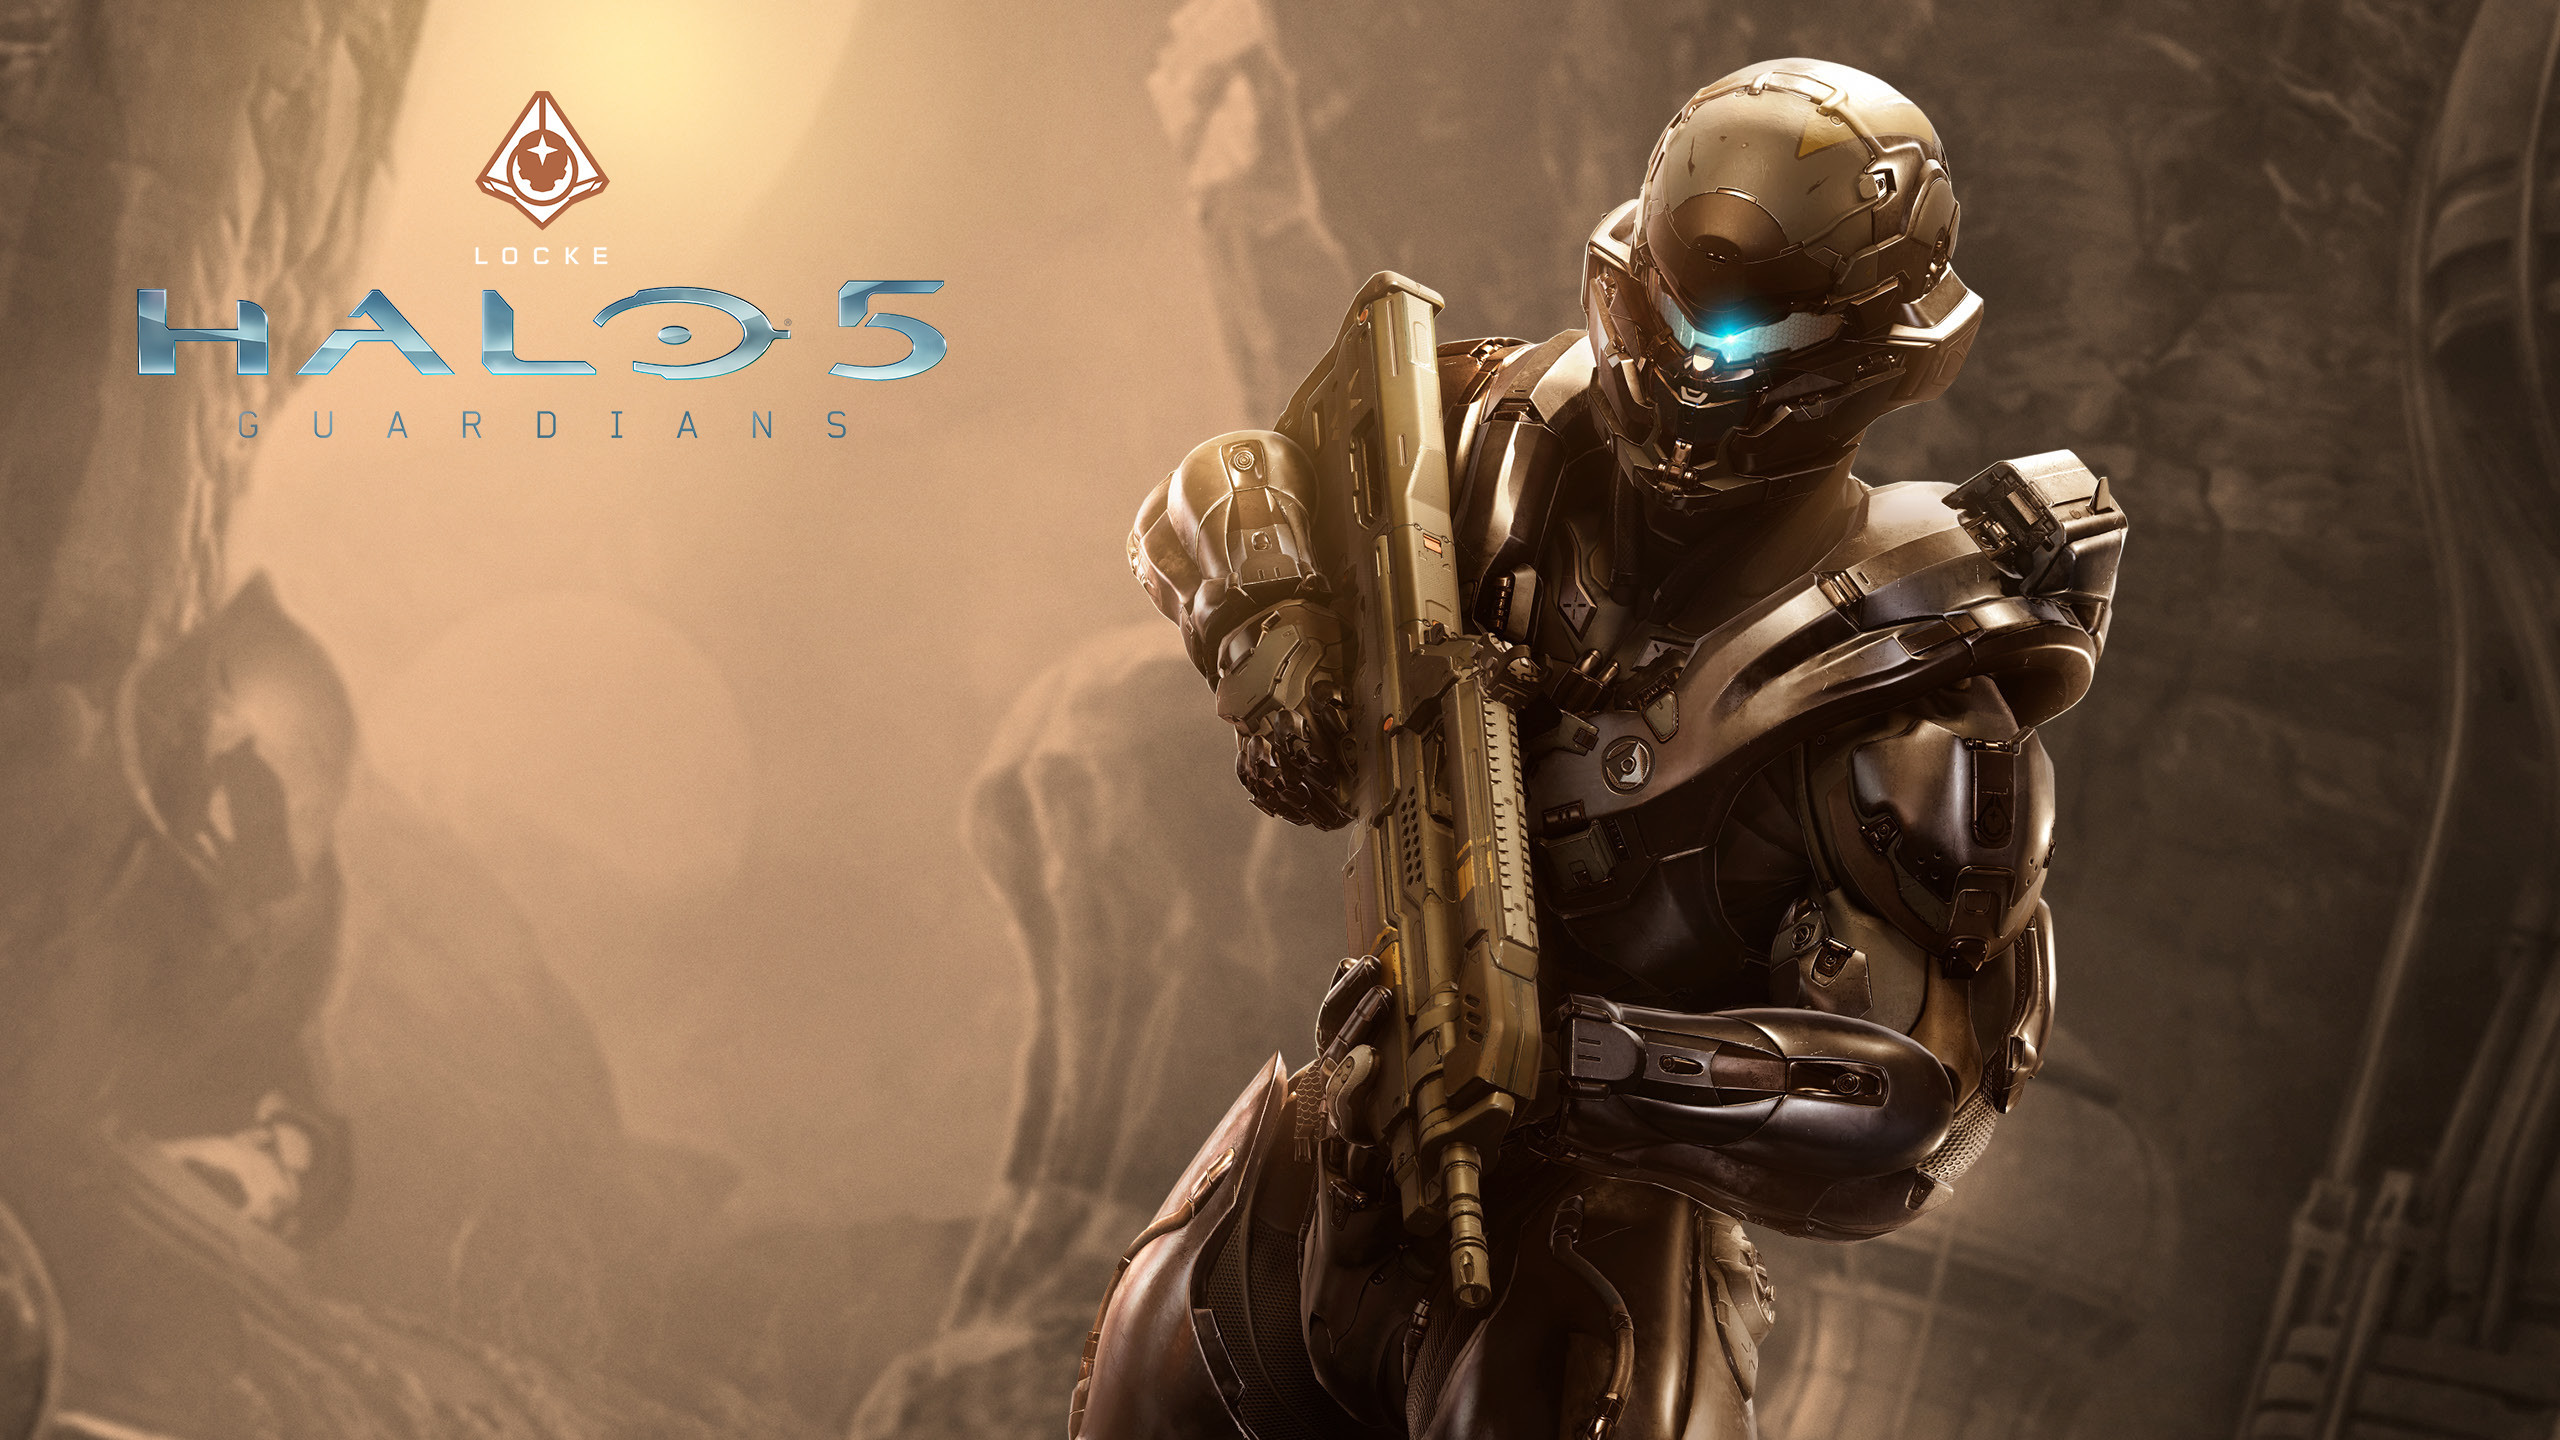 Halo 5 Guardians Wallpapers Wallpapertag